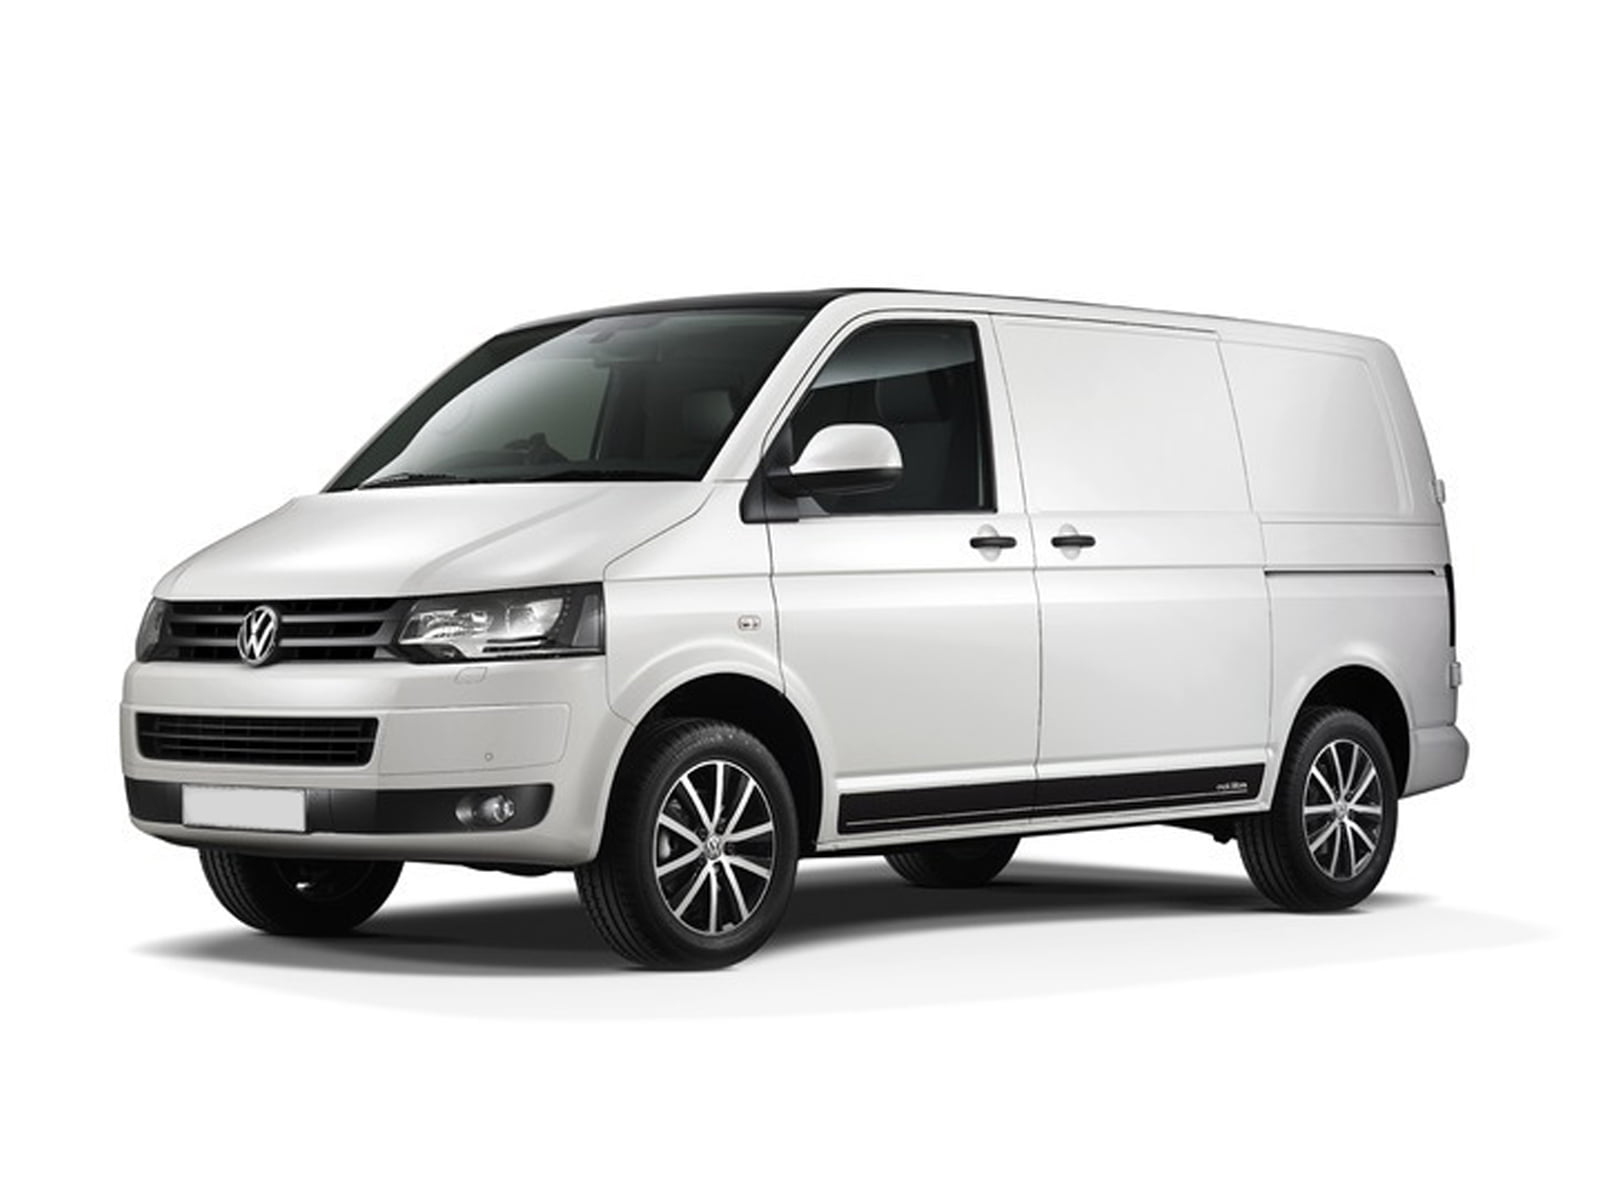 Volkswagen Transporter 2.0 TDI 62 kW 26T L1H1 4d.